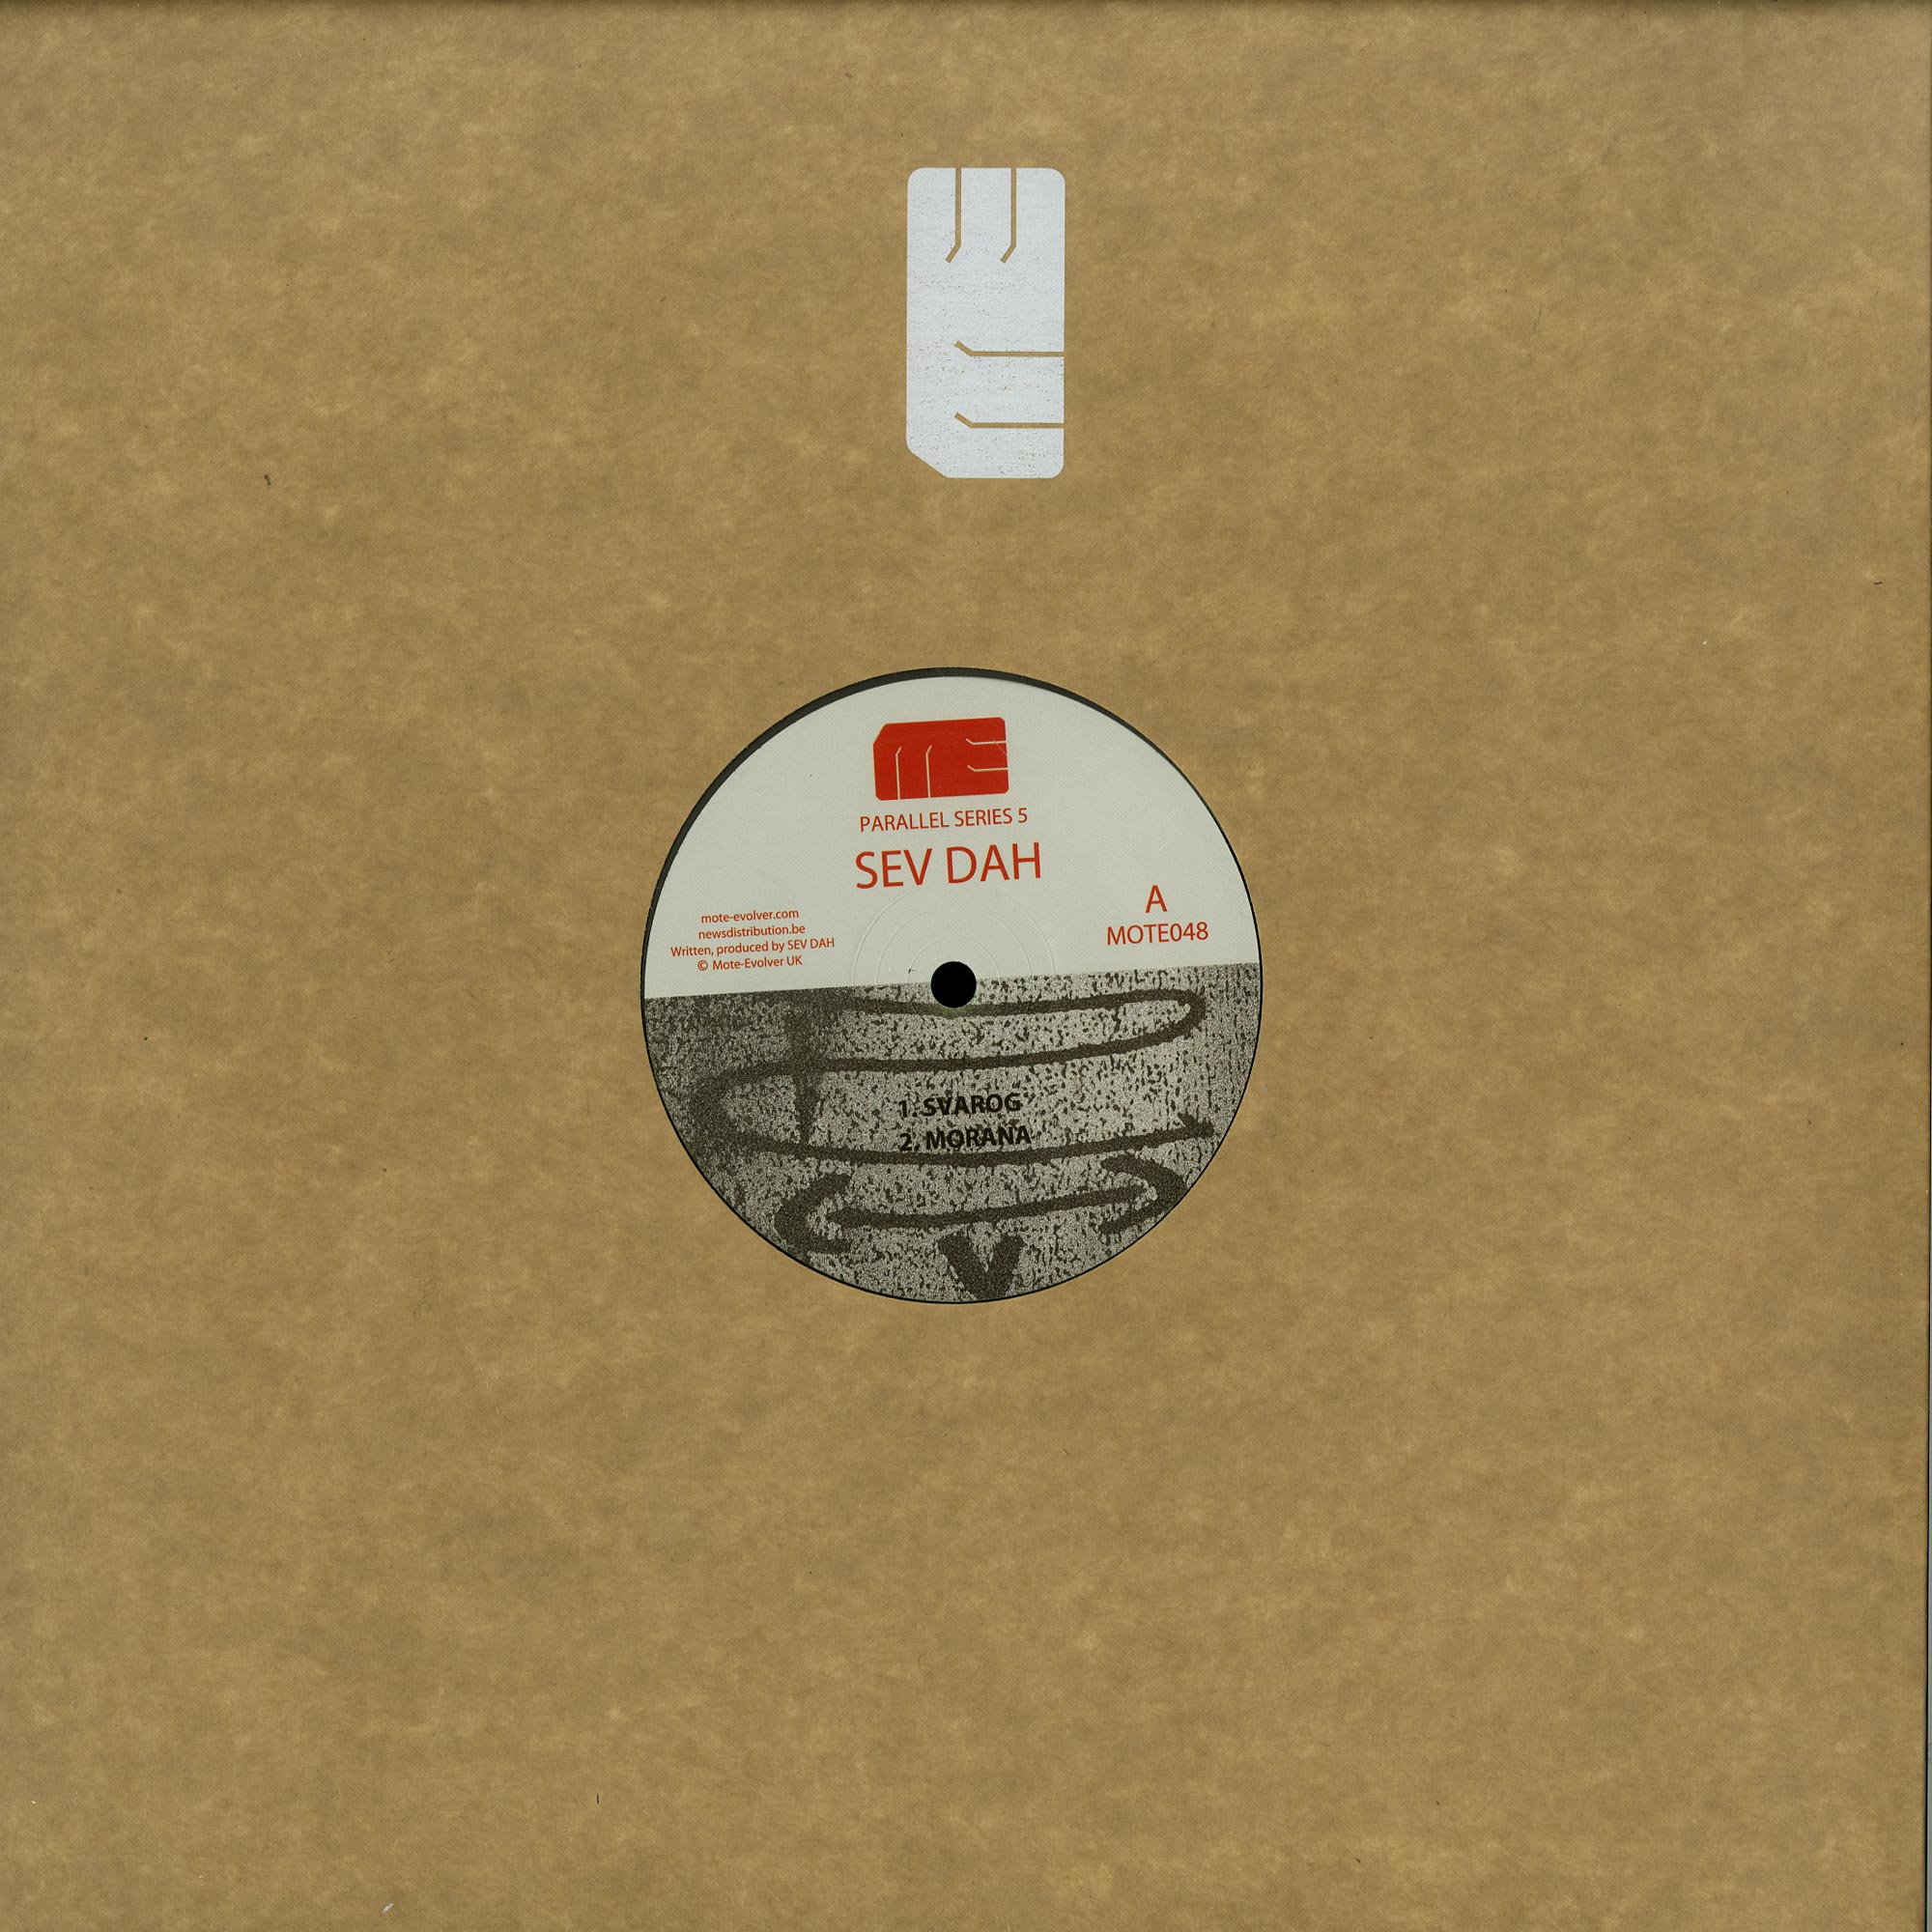 Sev Dah / Jeff Rushin - PARALLEL SERIES 5